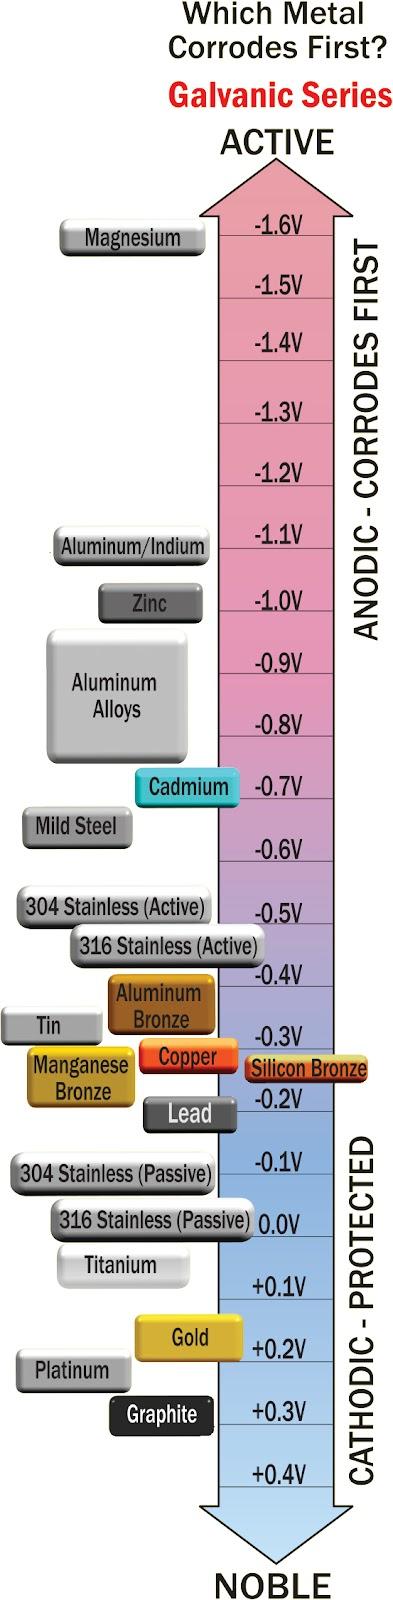 Performance-Metals---Metal-Corrosion-Chart.jpg